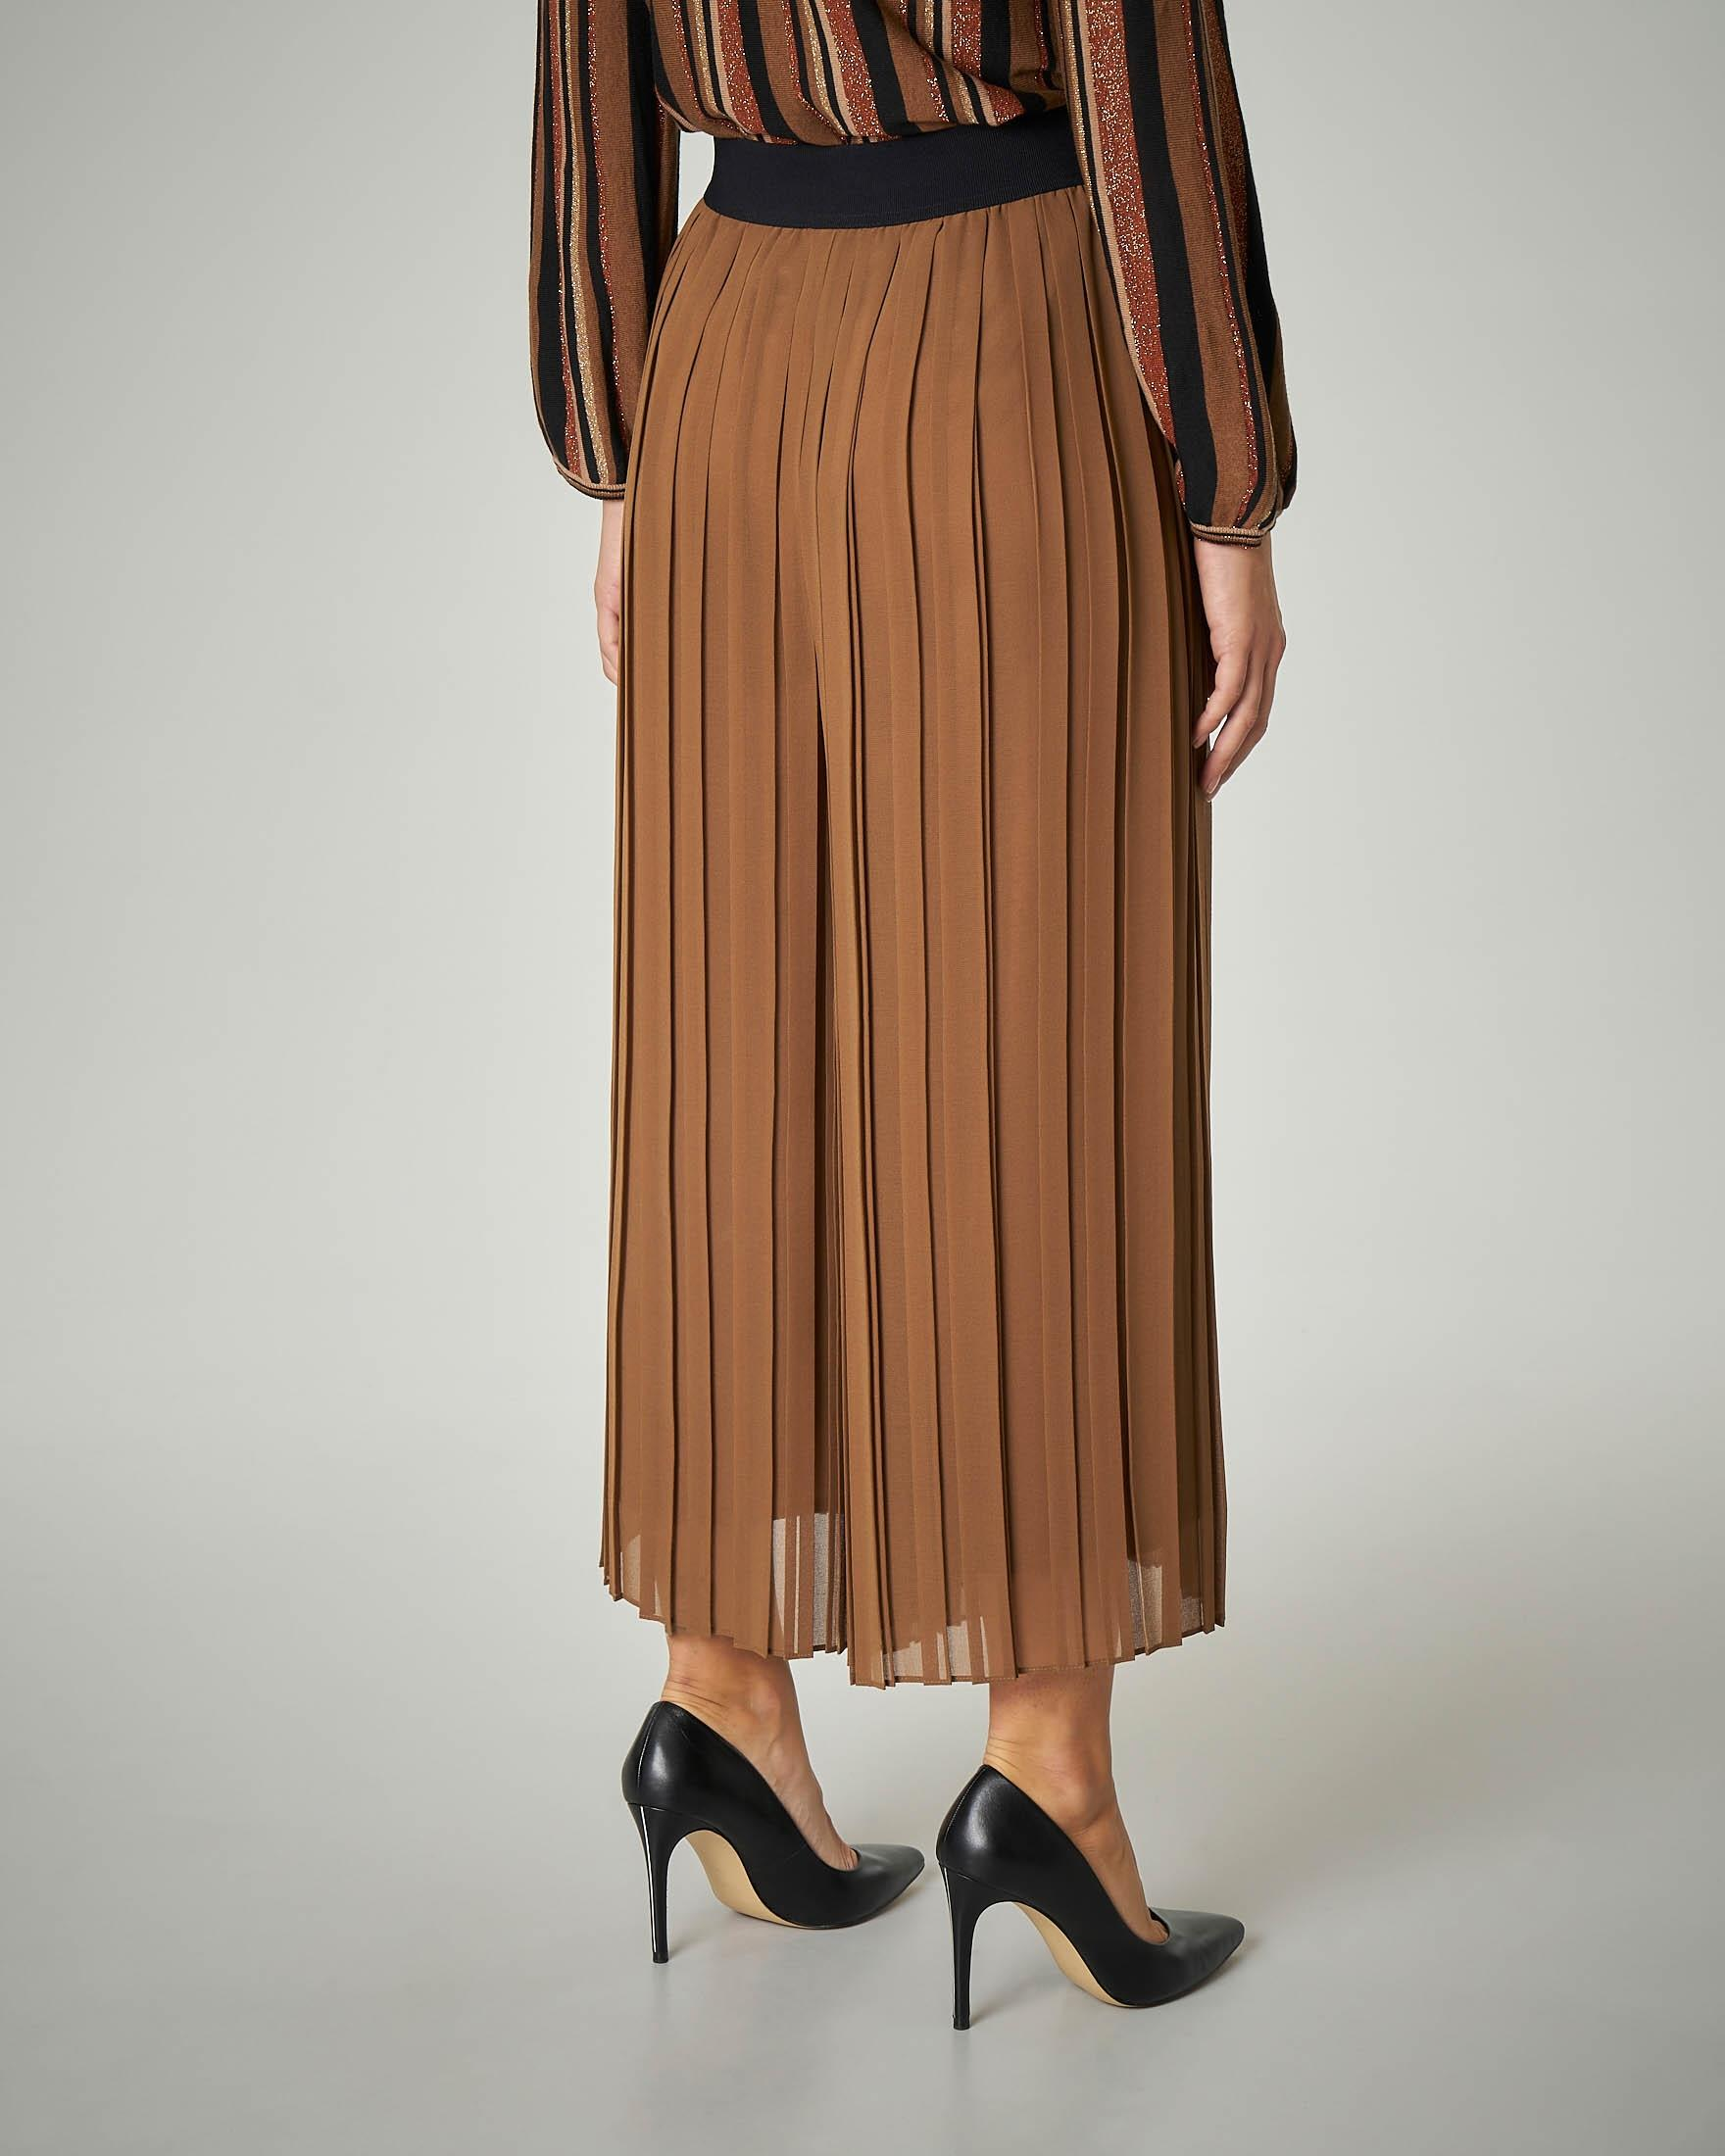 Gonna-pantalone plissè color cammello